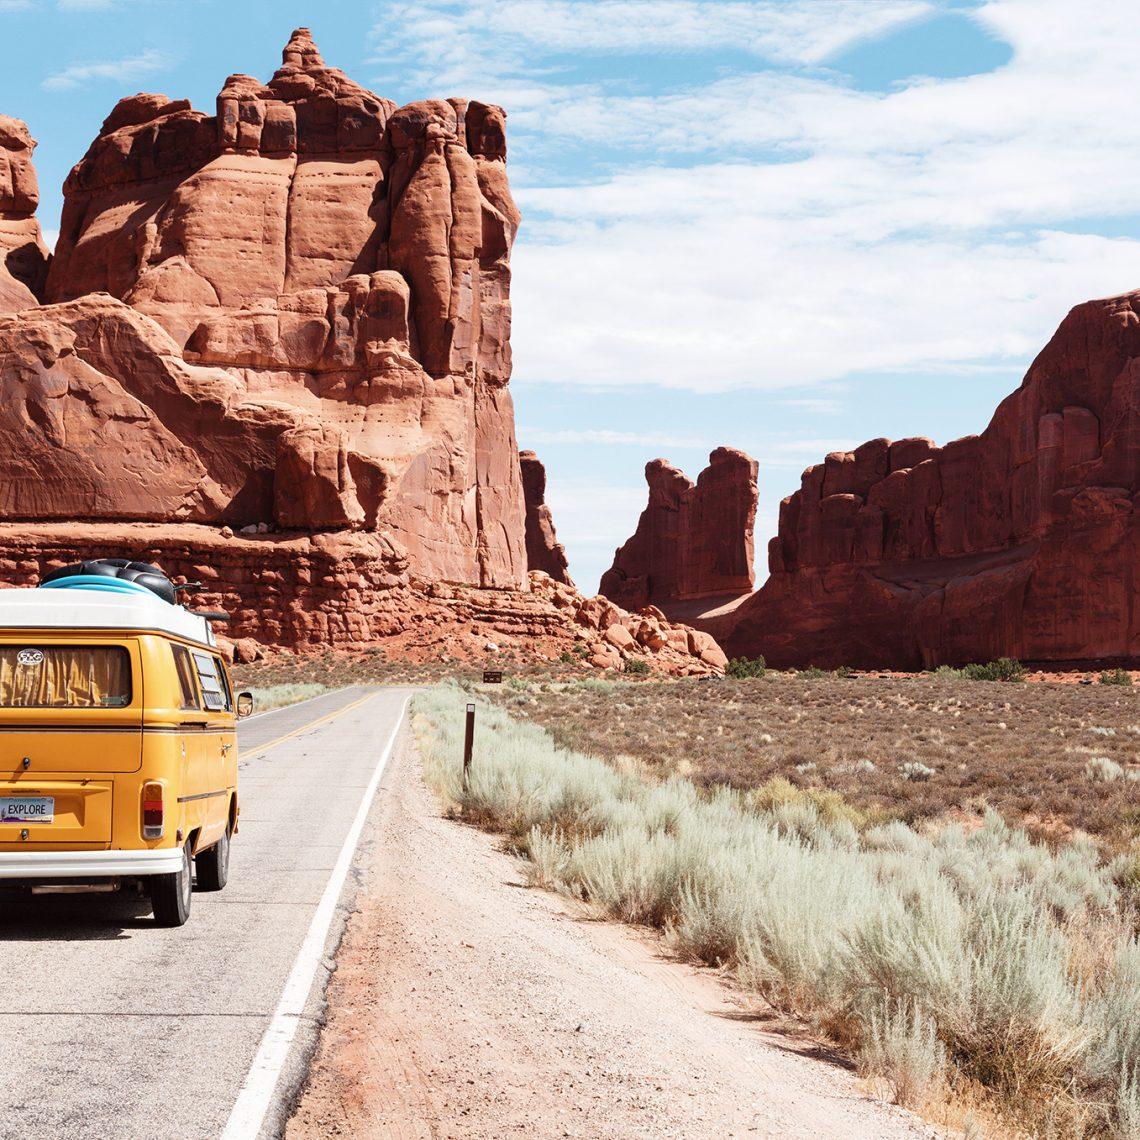 Arches National Park Entrance Station, Moab, United States, © @dinoreichmuth, unsplash.com